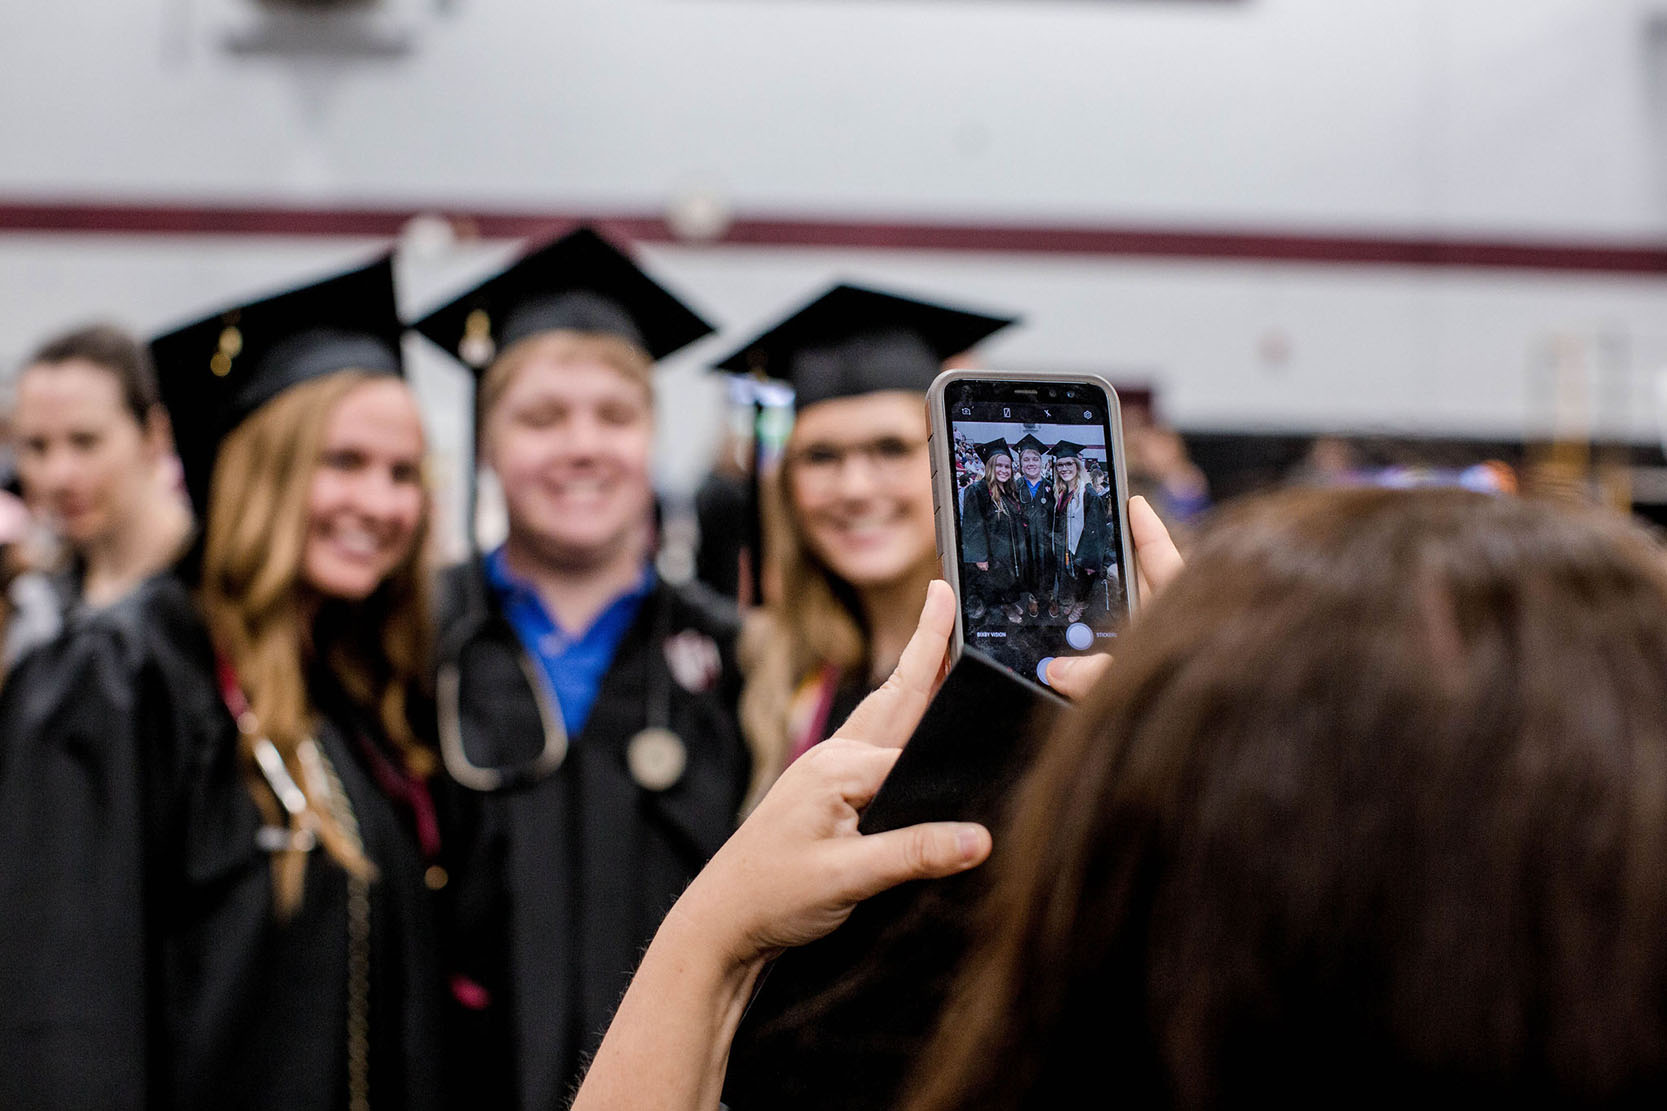 Group of students at graduation